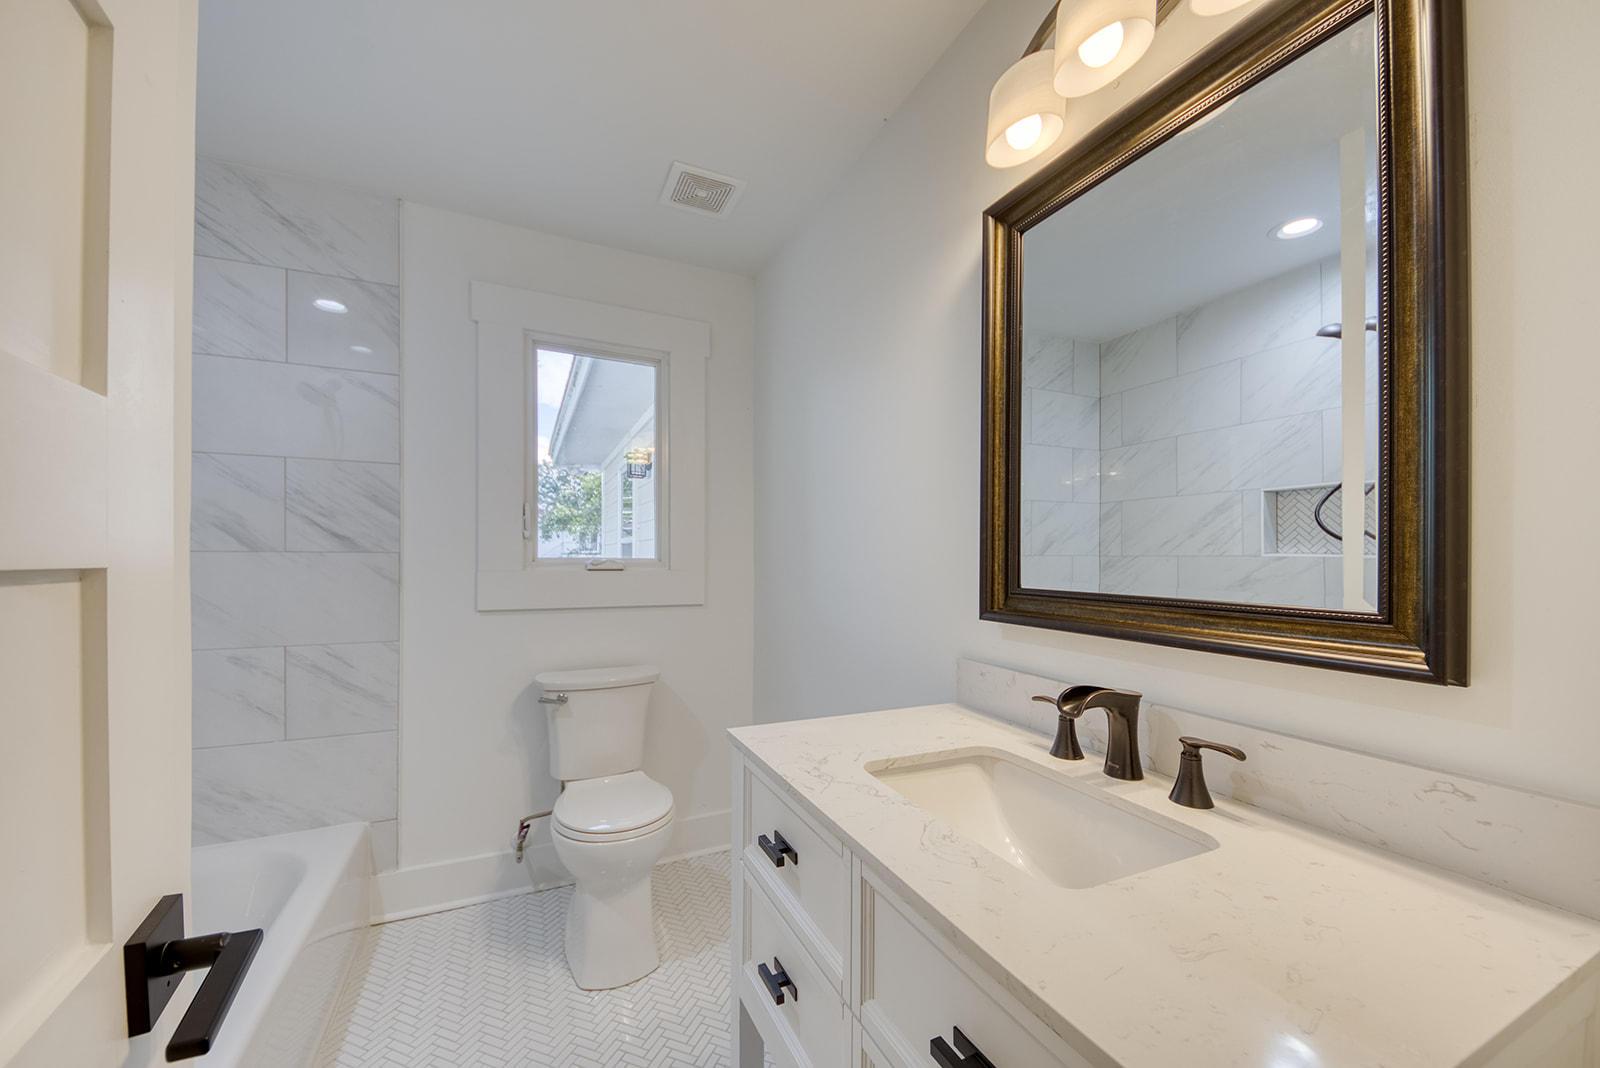 Bay View Acres Homes For Sale - 265 Coleman, Mount Pleasant, SC - 60